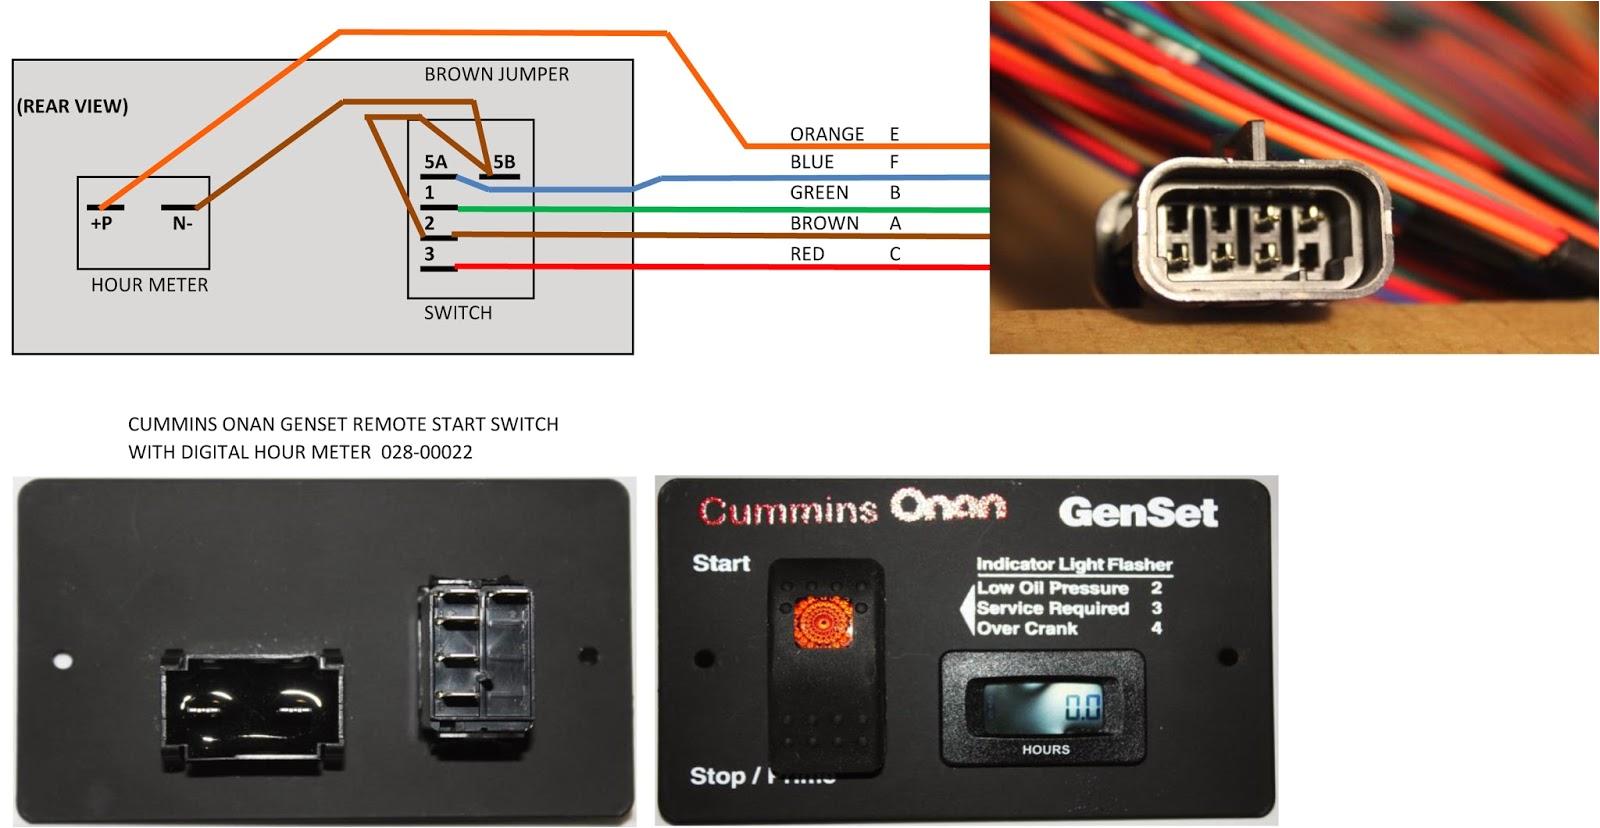 onan generator wiring harness wiring diagram files onan 7000 generator remote start switch wiring diagram onan remote start wiring diagram